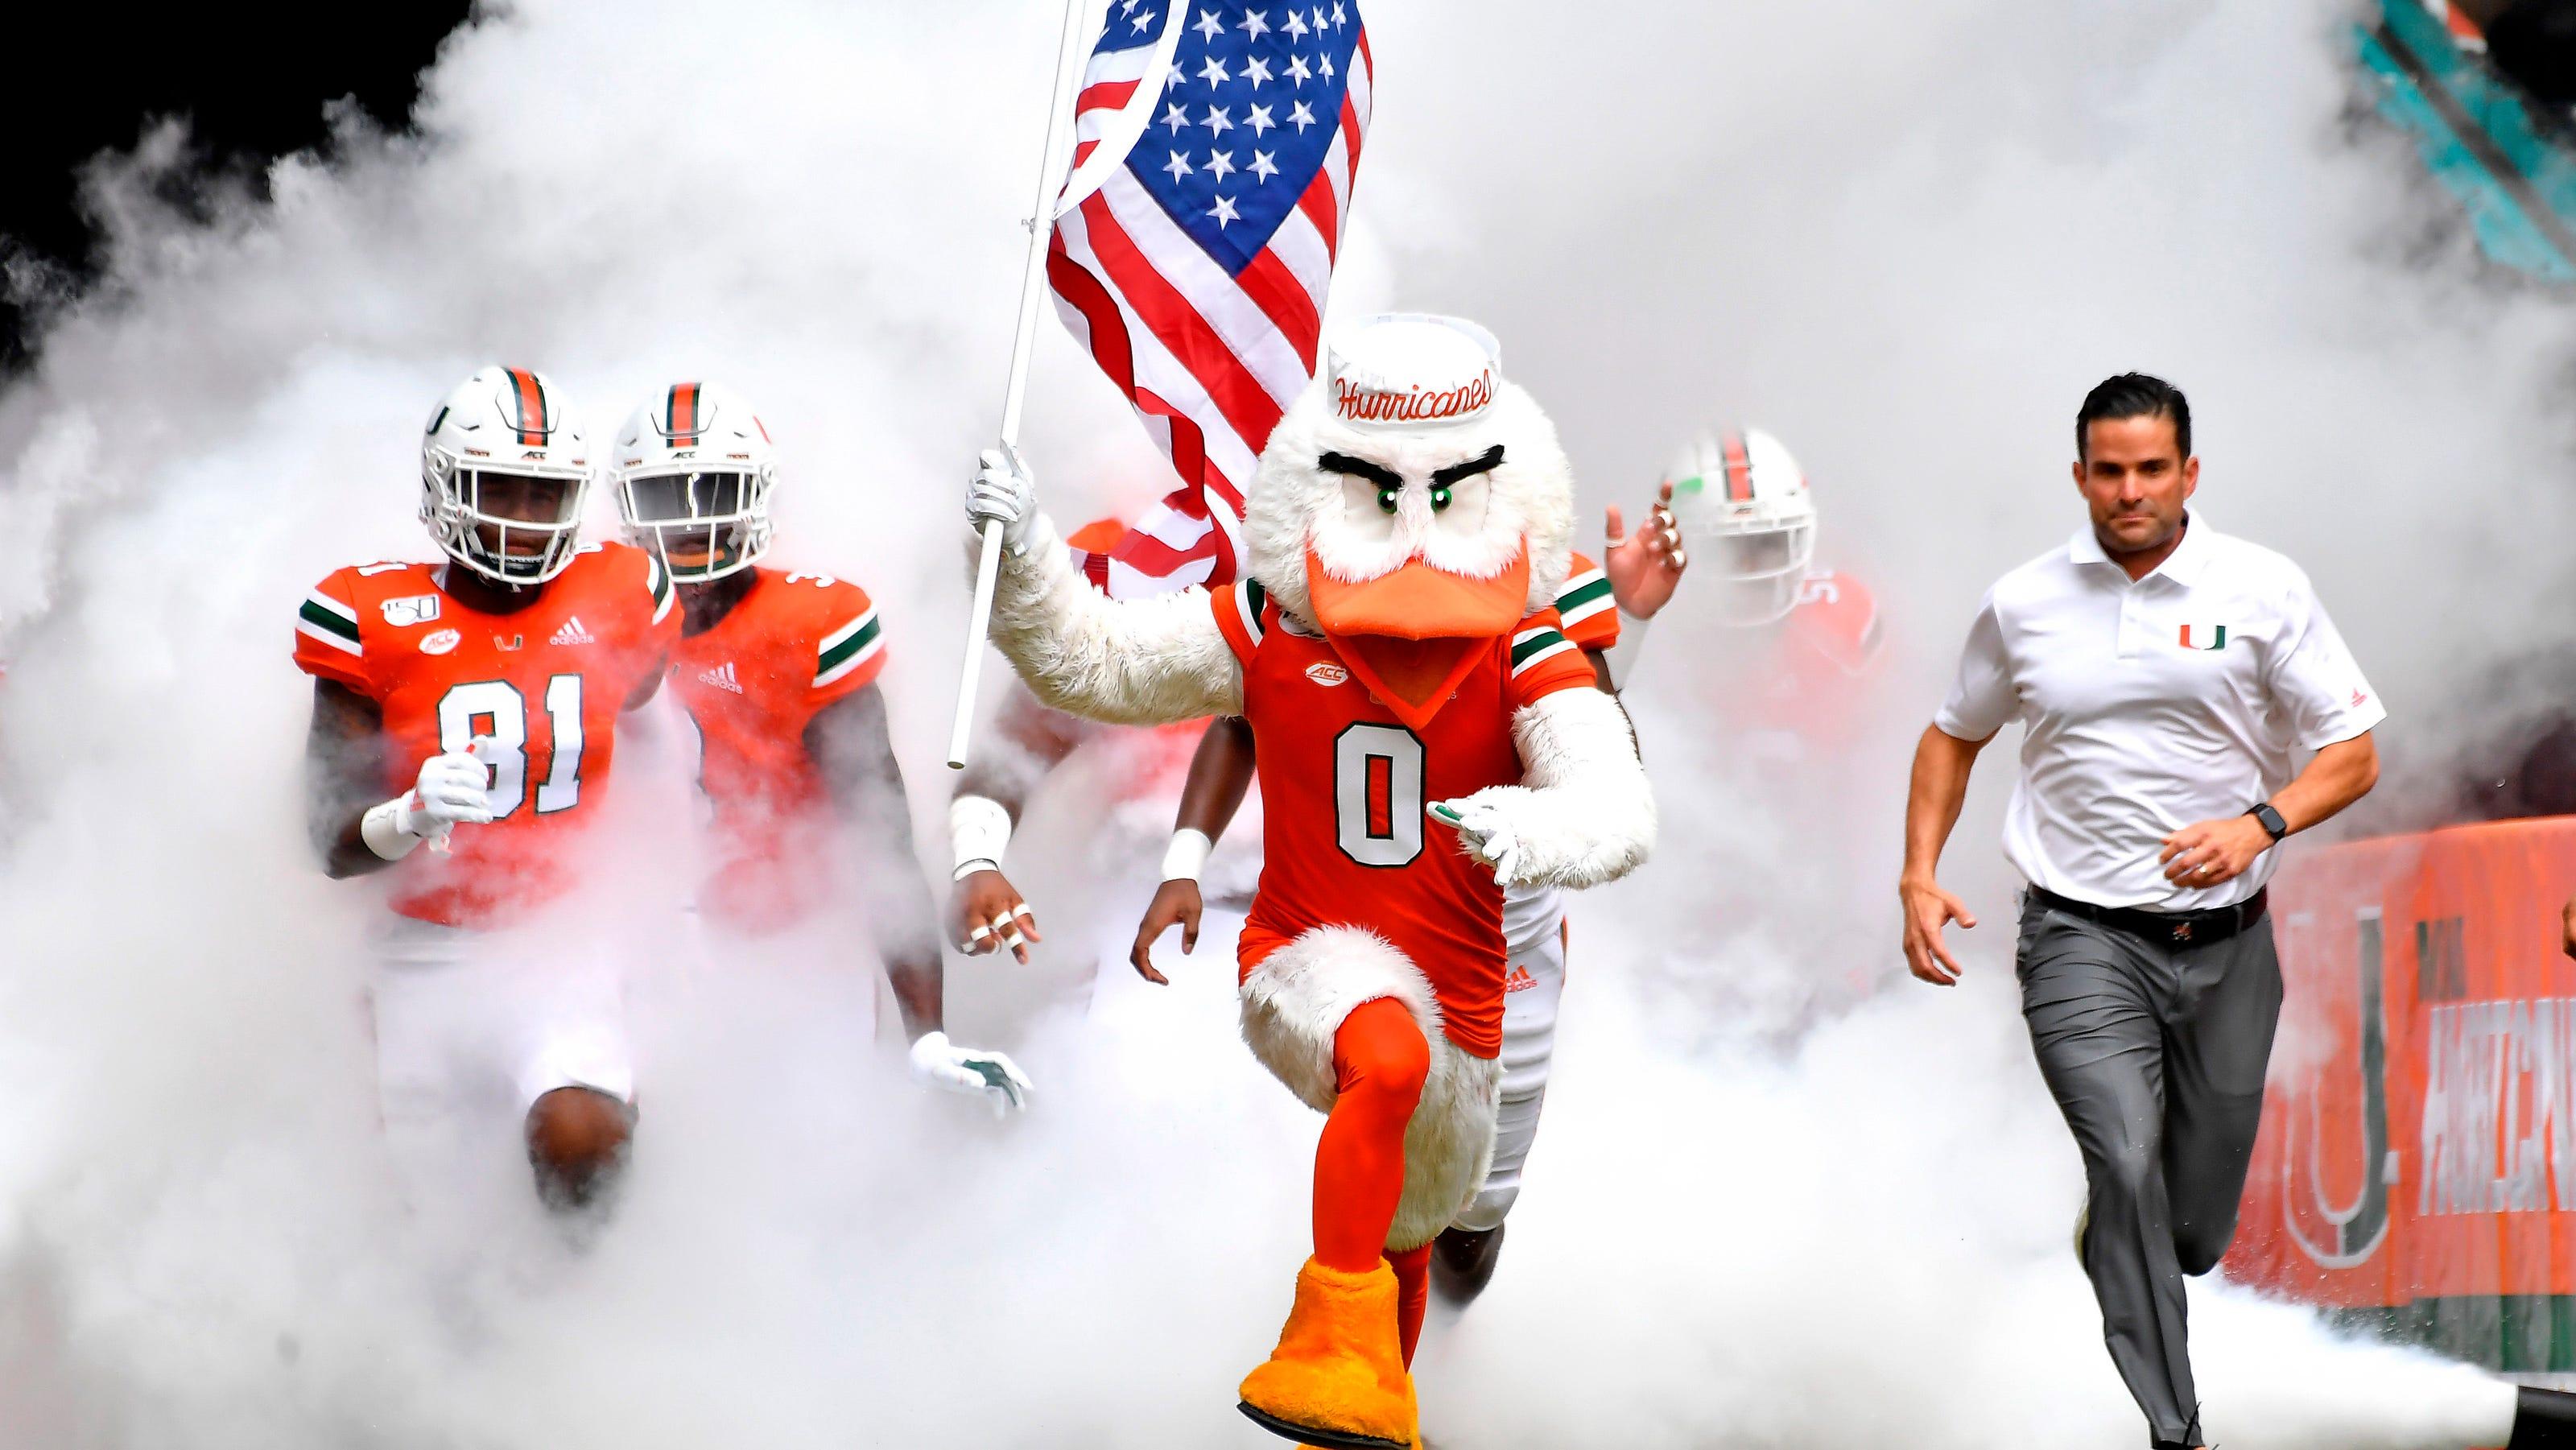 How to watch Miami Hurricanes vs. UAB Blazers football on TV, live stream